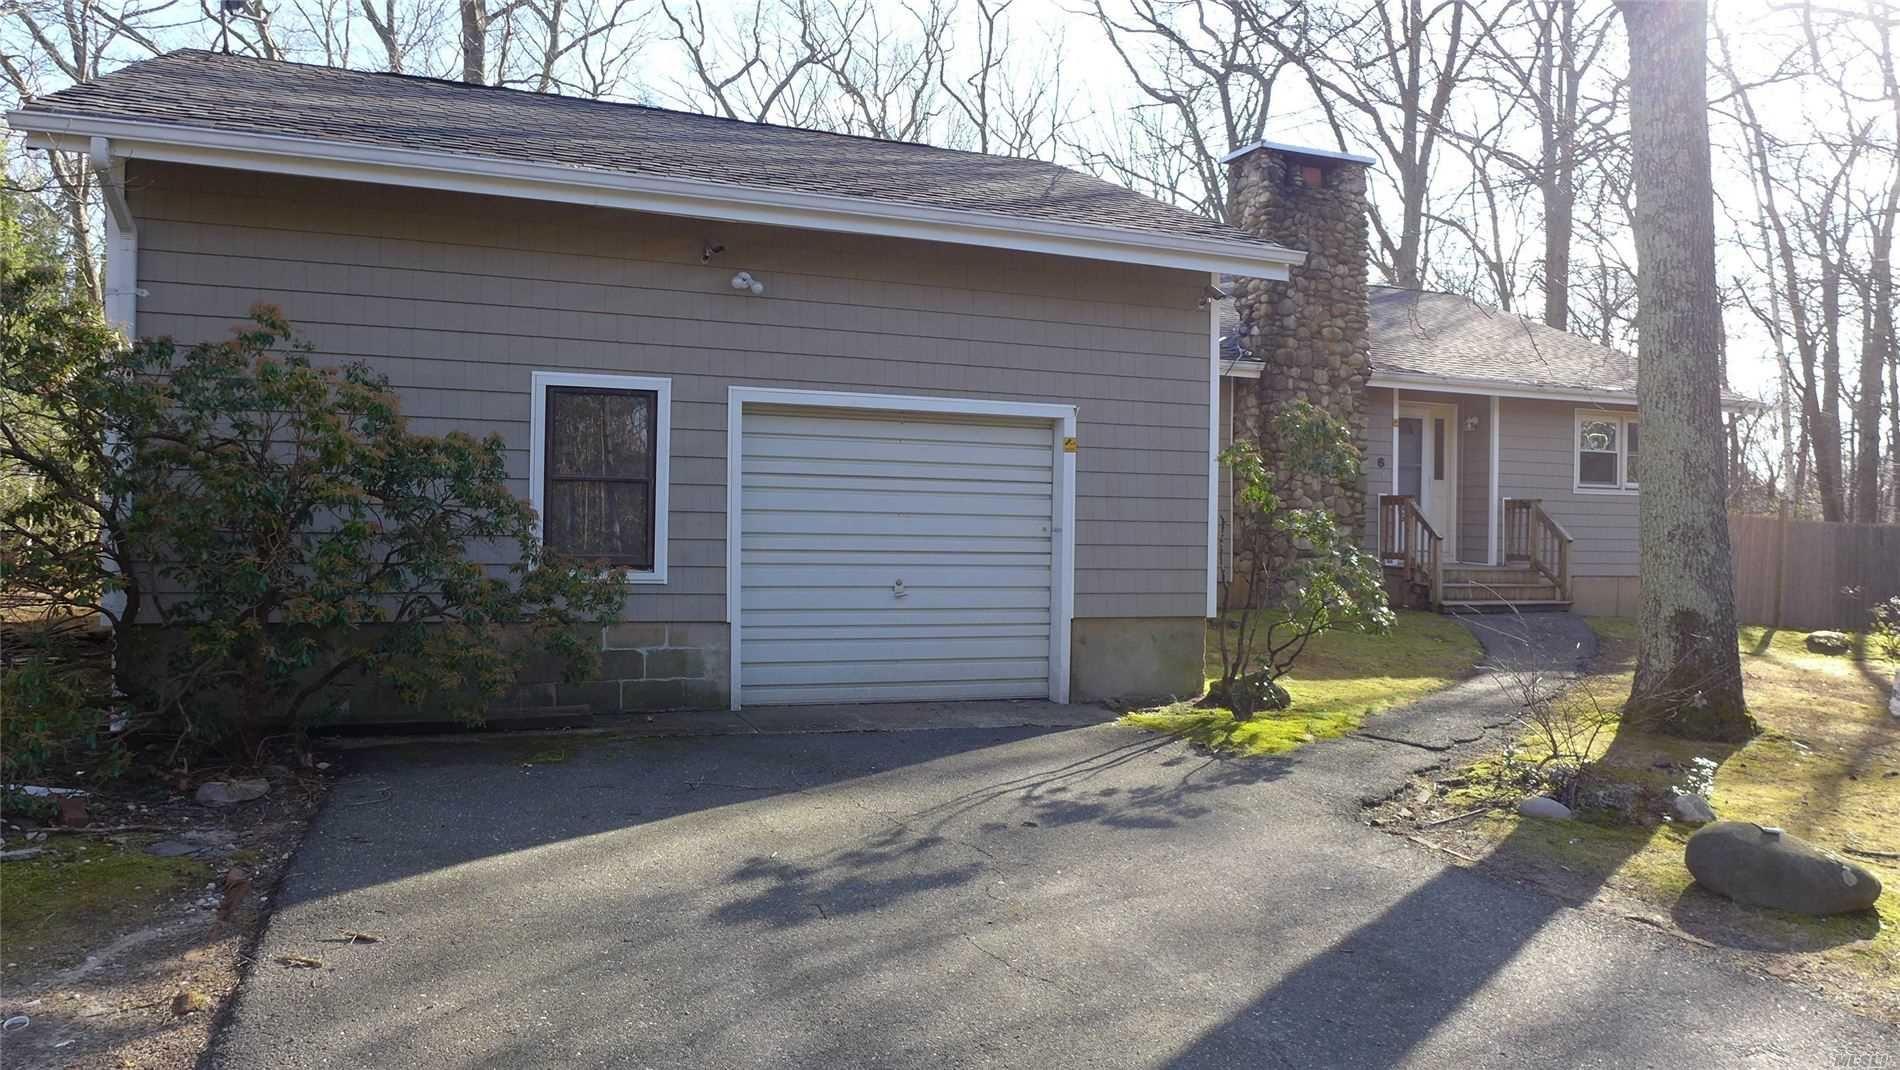 6 Pine Road, Coram, NY 11727 - MLS#: 3204954